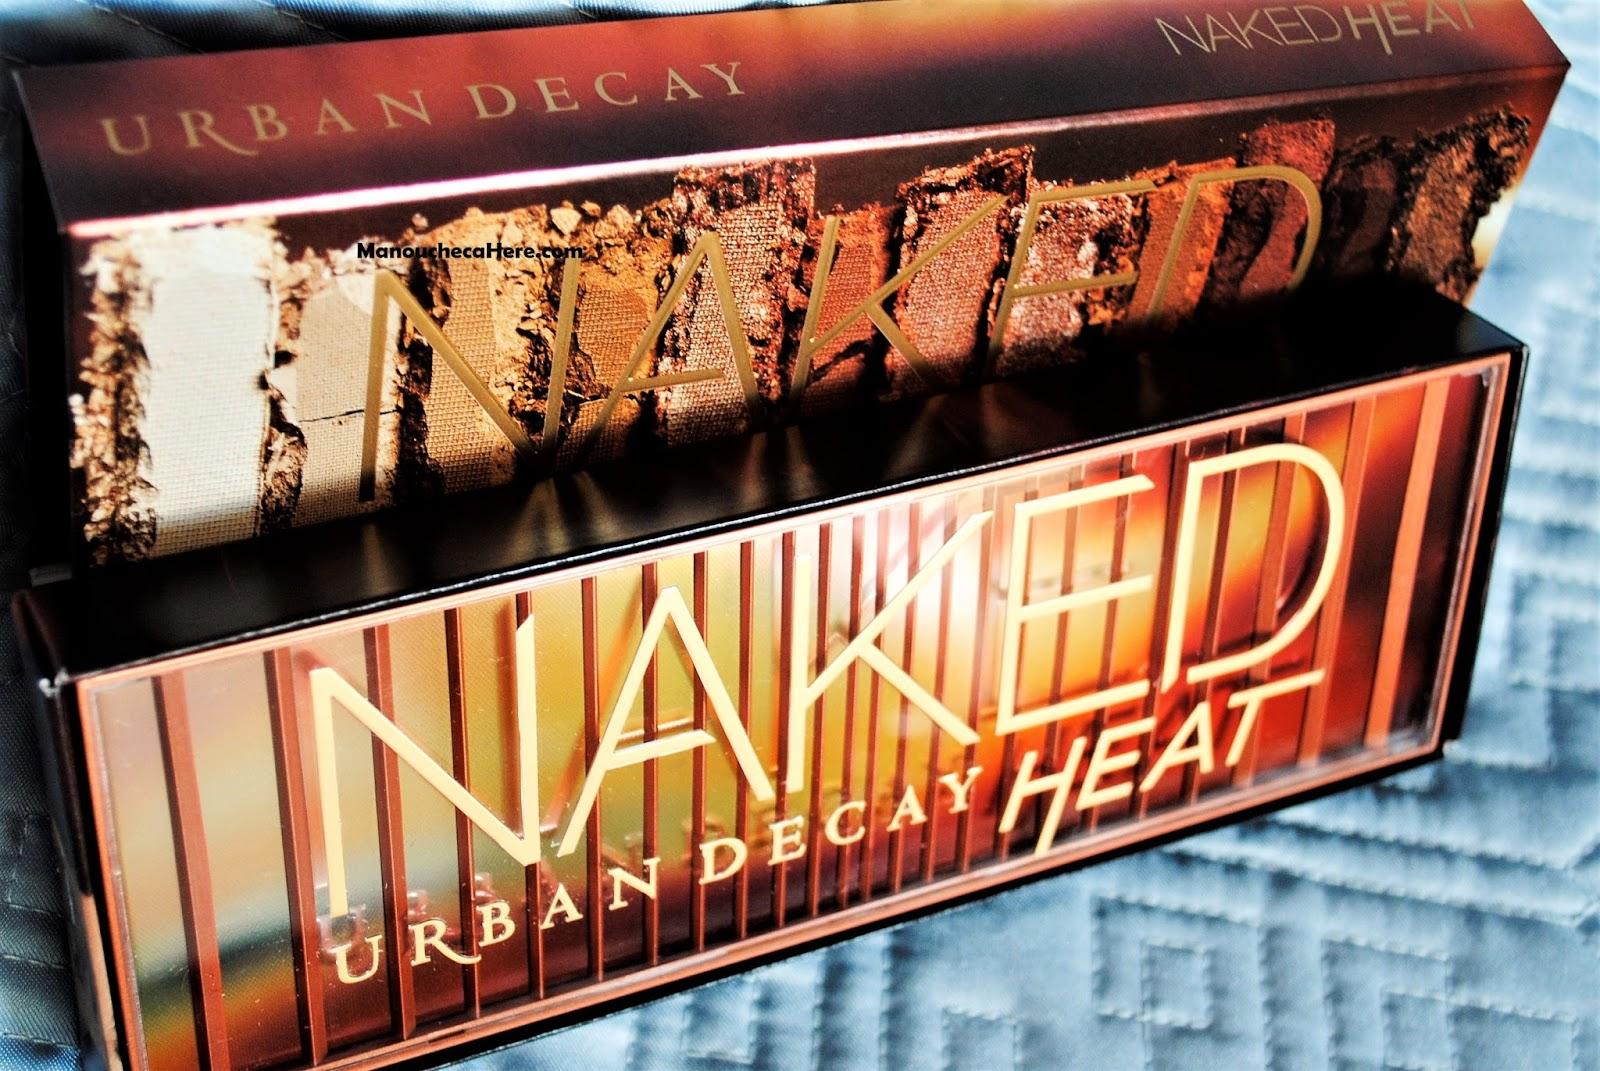 URBAN DECAY熾夏眼影盤Naked Heat Eyeshadow Palette 8